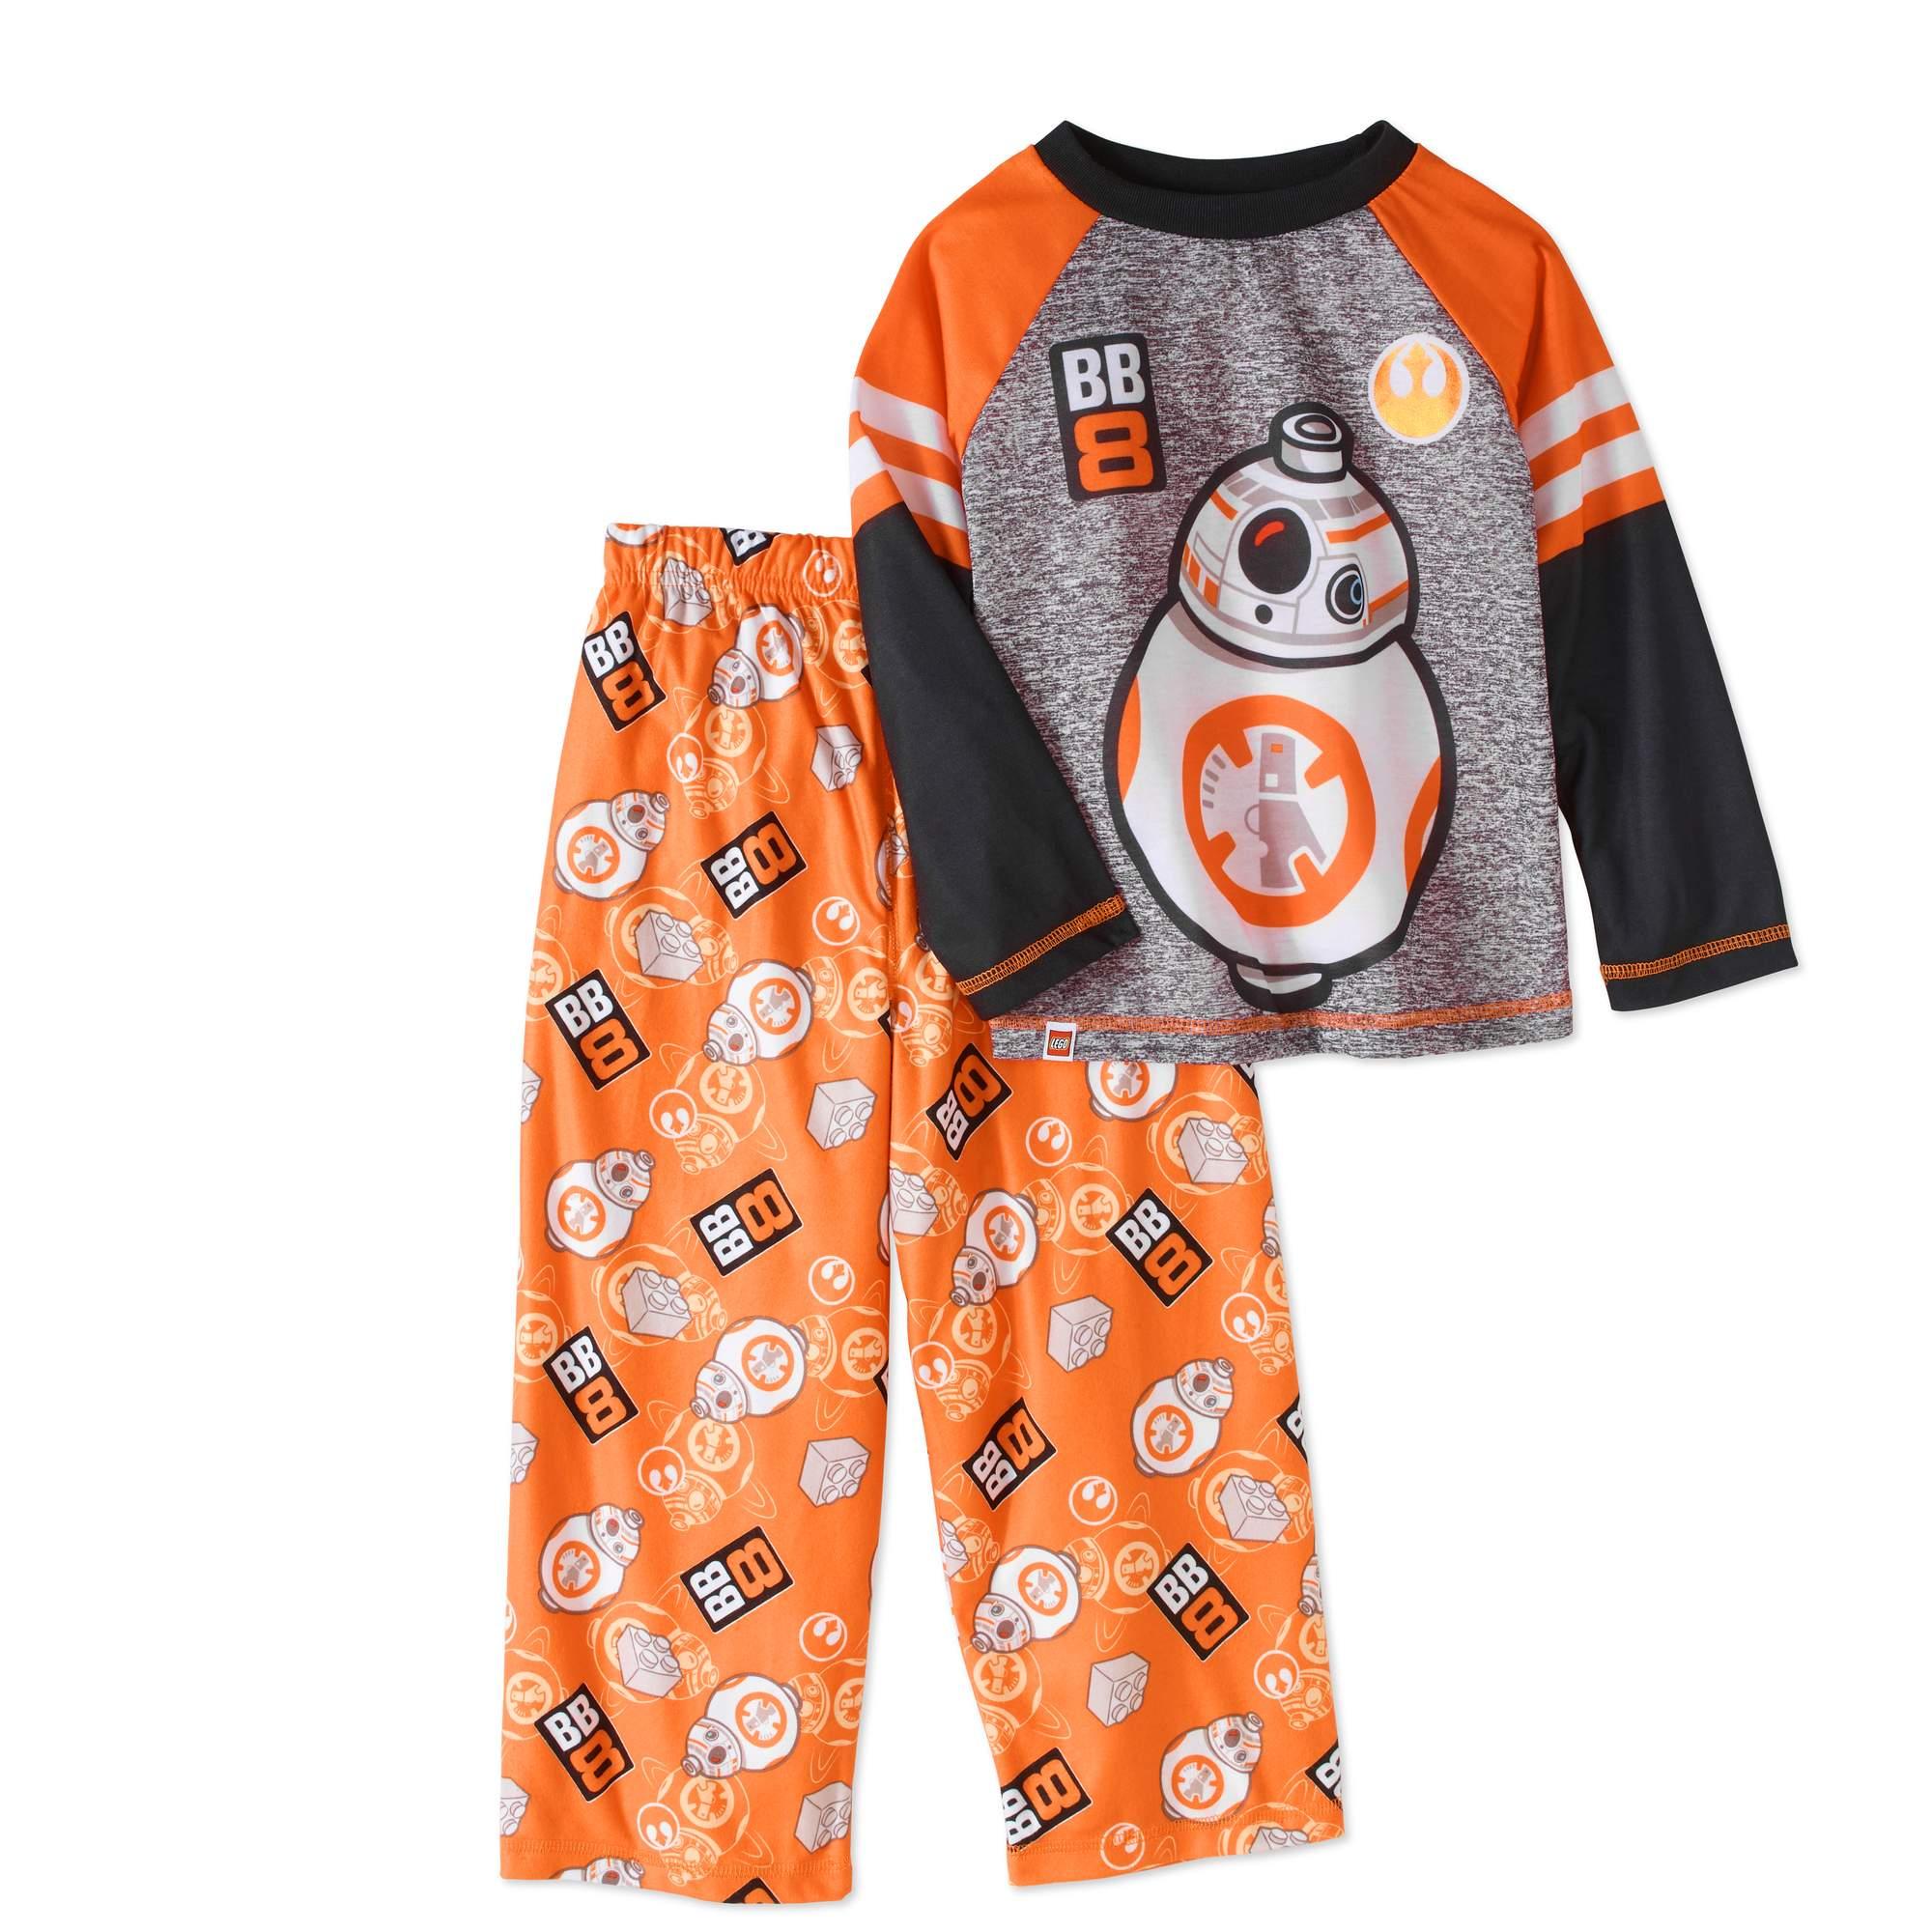 LEGO Star Wars Boys' Jersey Top and Fleece Pants Pajama 2 - Piece Sleepwear Set